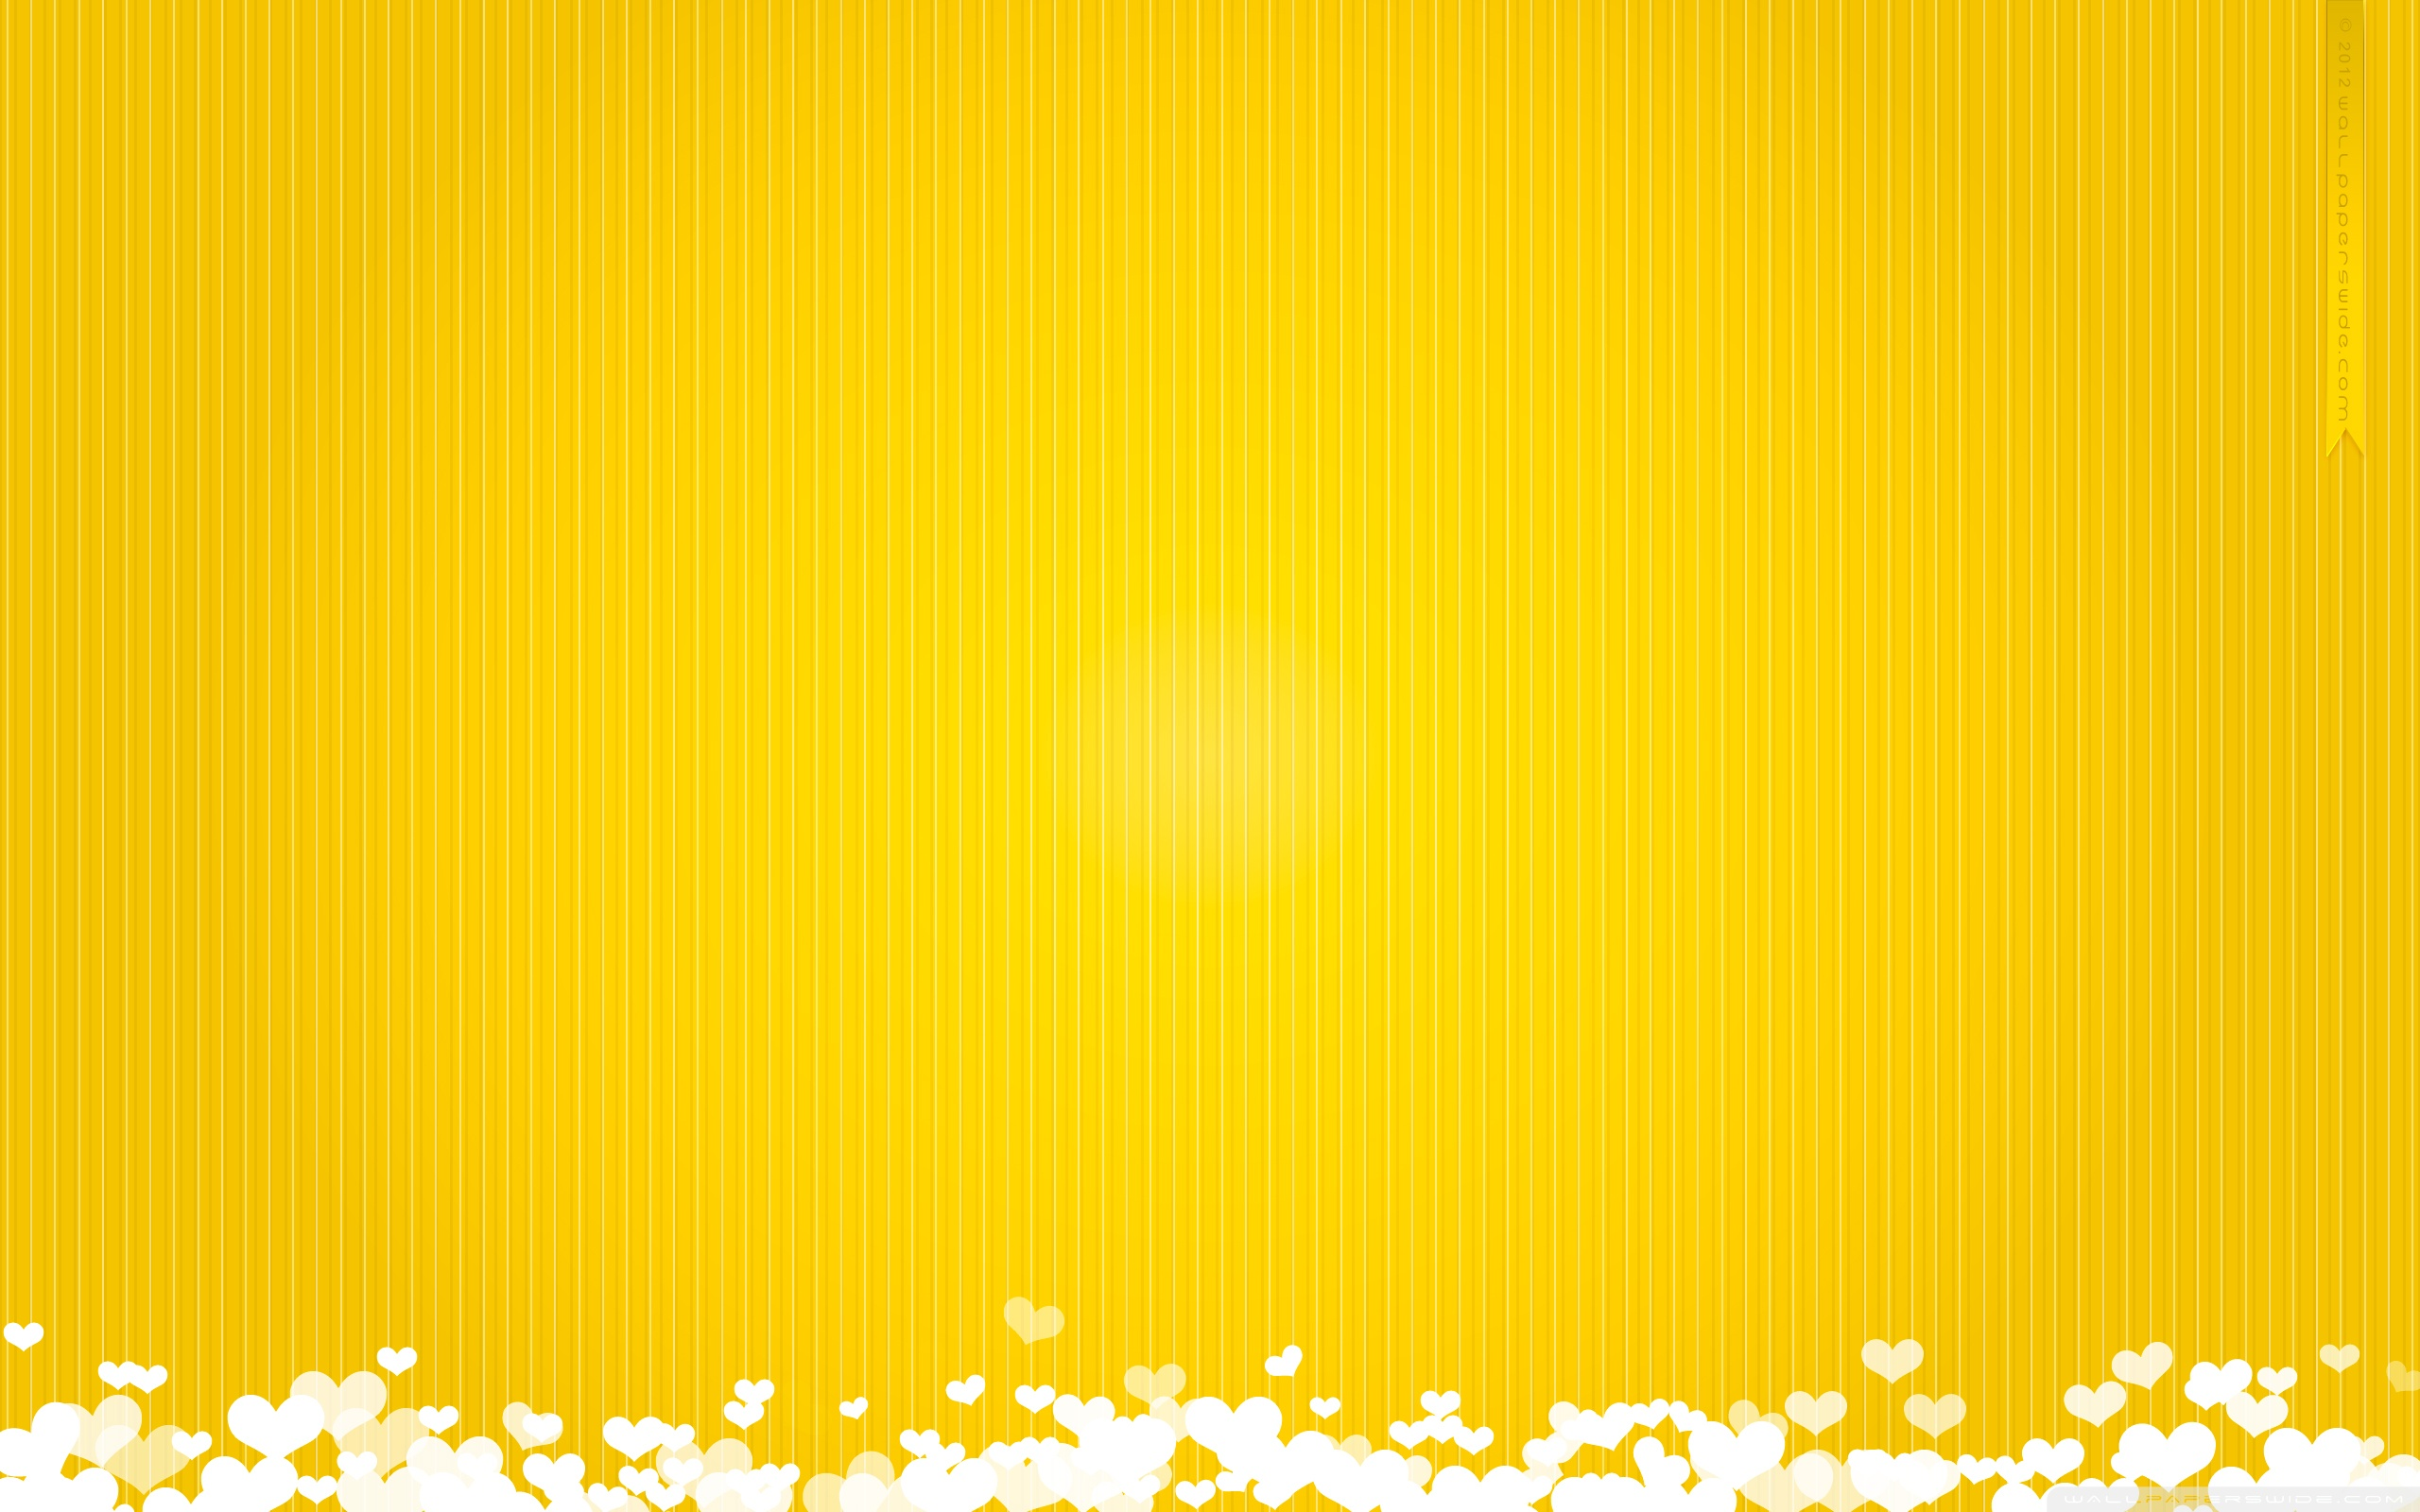 yellow wallpaper 1 yellow wallpaper 2 ...